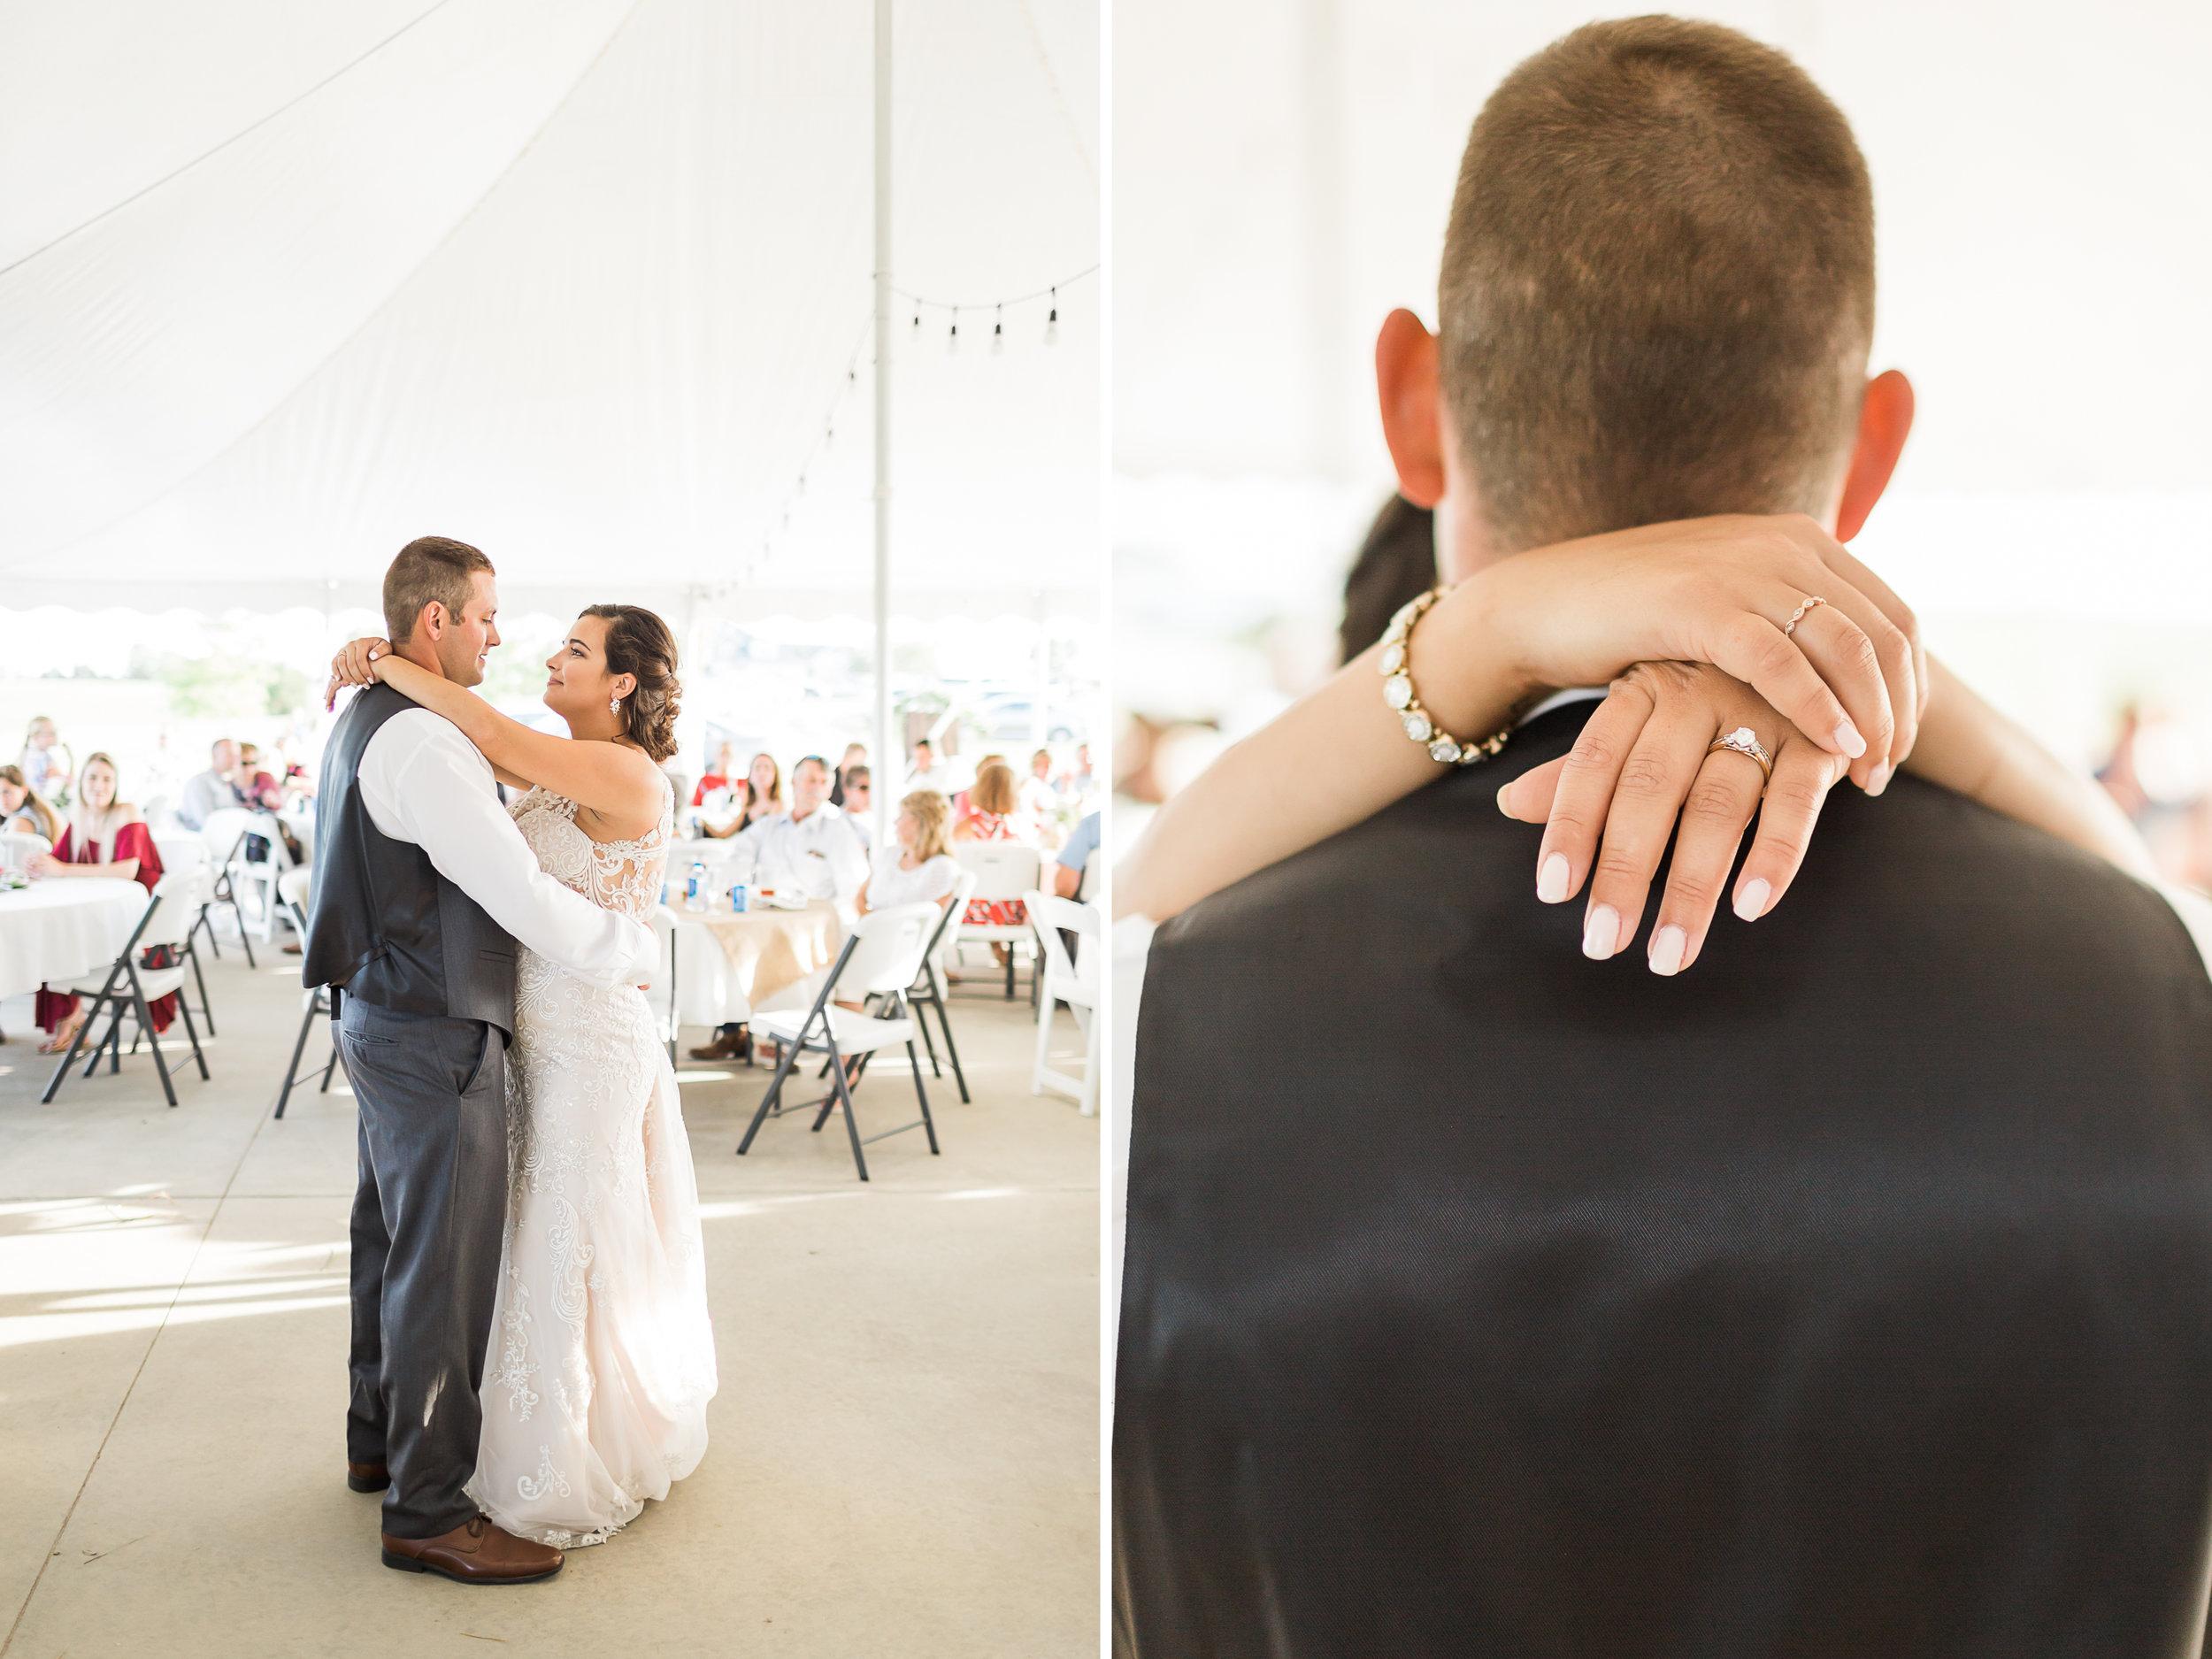 romanticcountrywedding-15.jpg